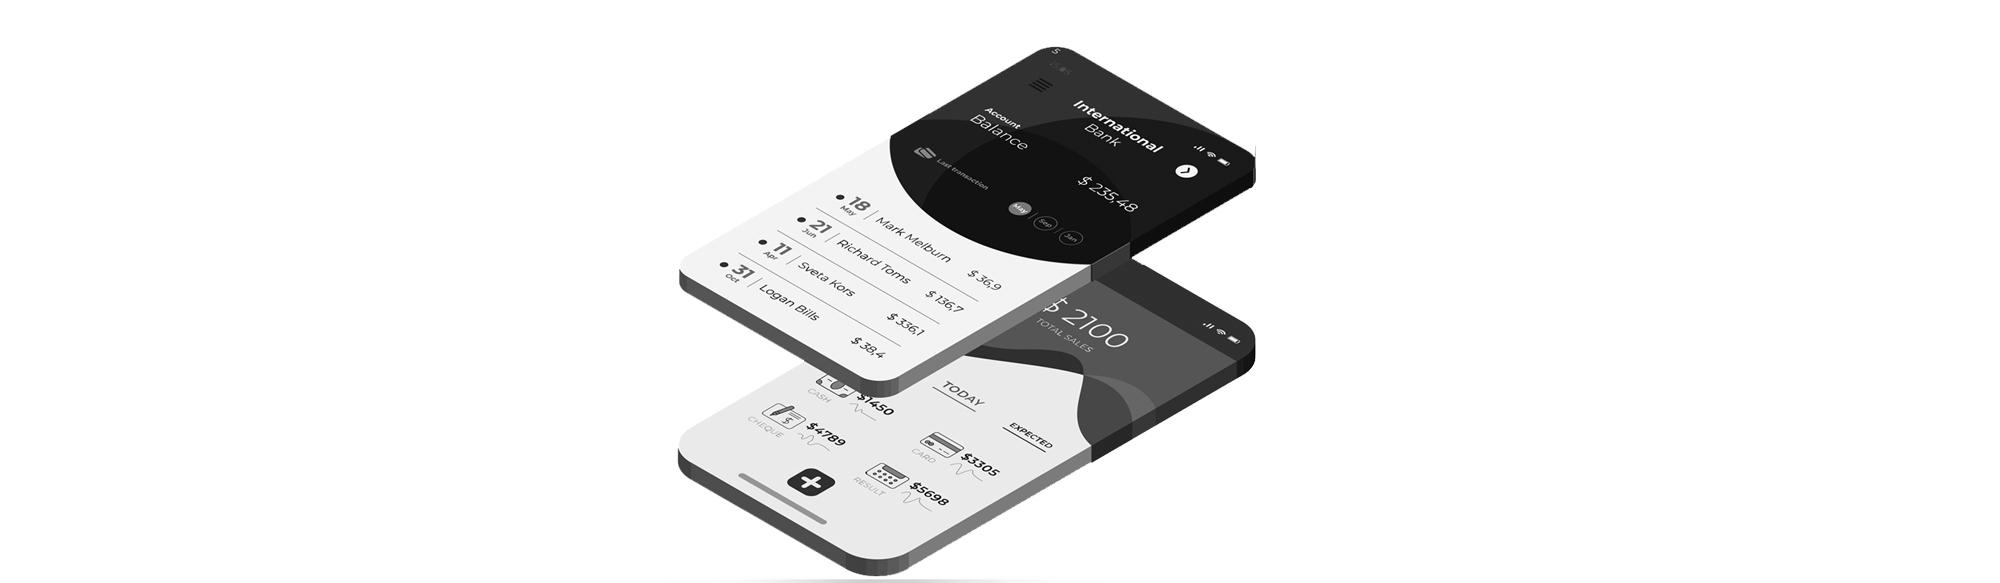 mejores apps de bancos